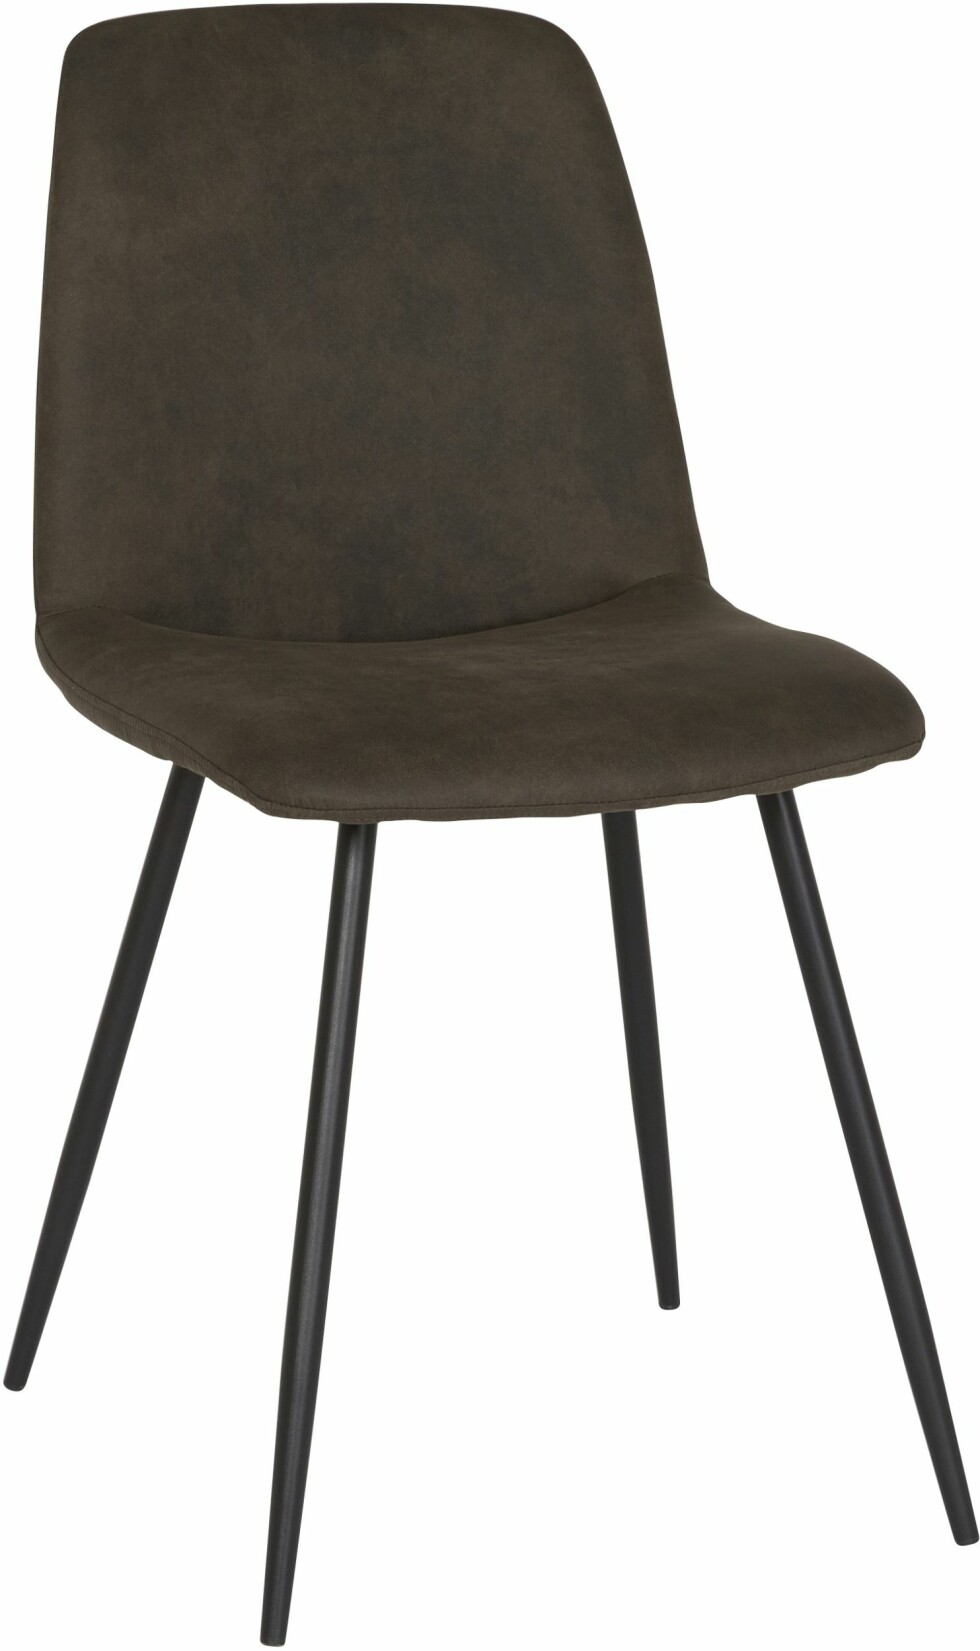 Spisebordsstolen «Smokey» har vintage-grått stoff og svarte metallbein (kr 699, Bohus).